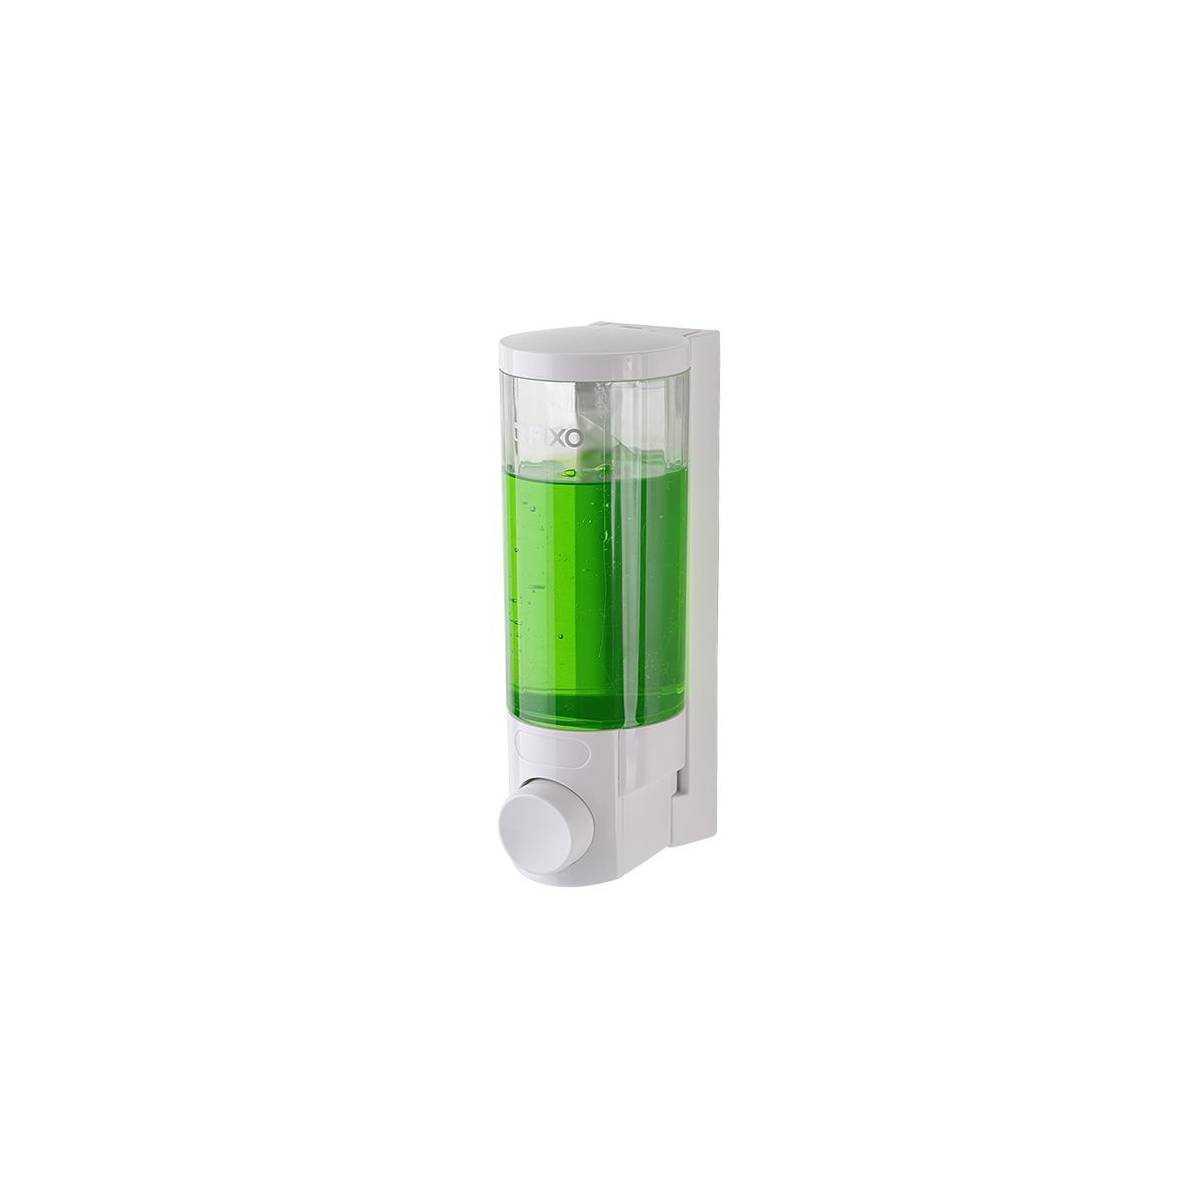 Дозатор жидкого мыла 300 мл Rixo Lungo S006W Rixo